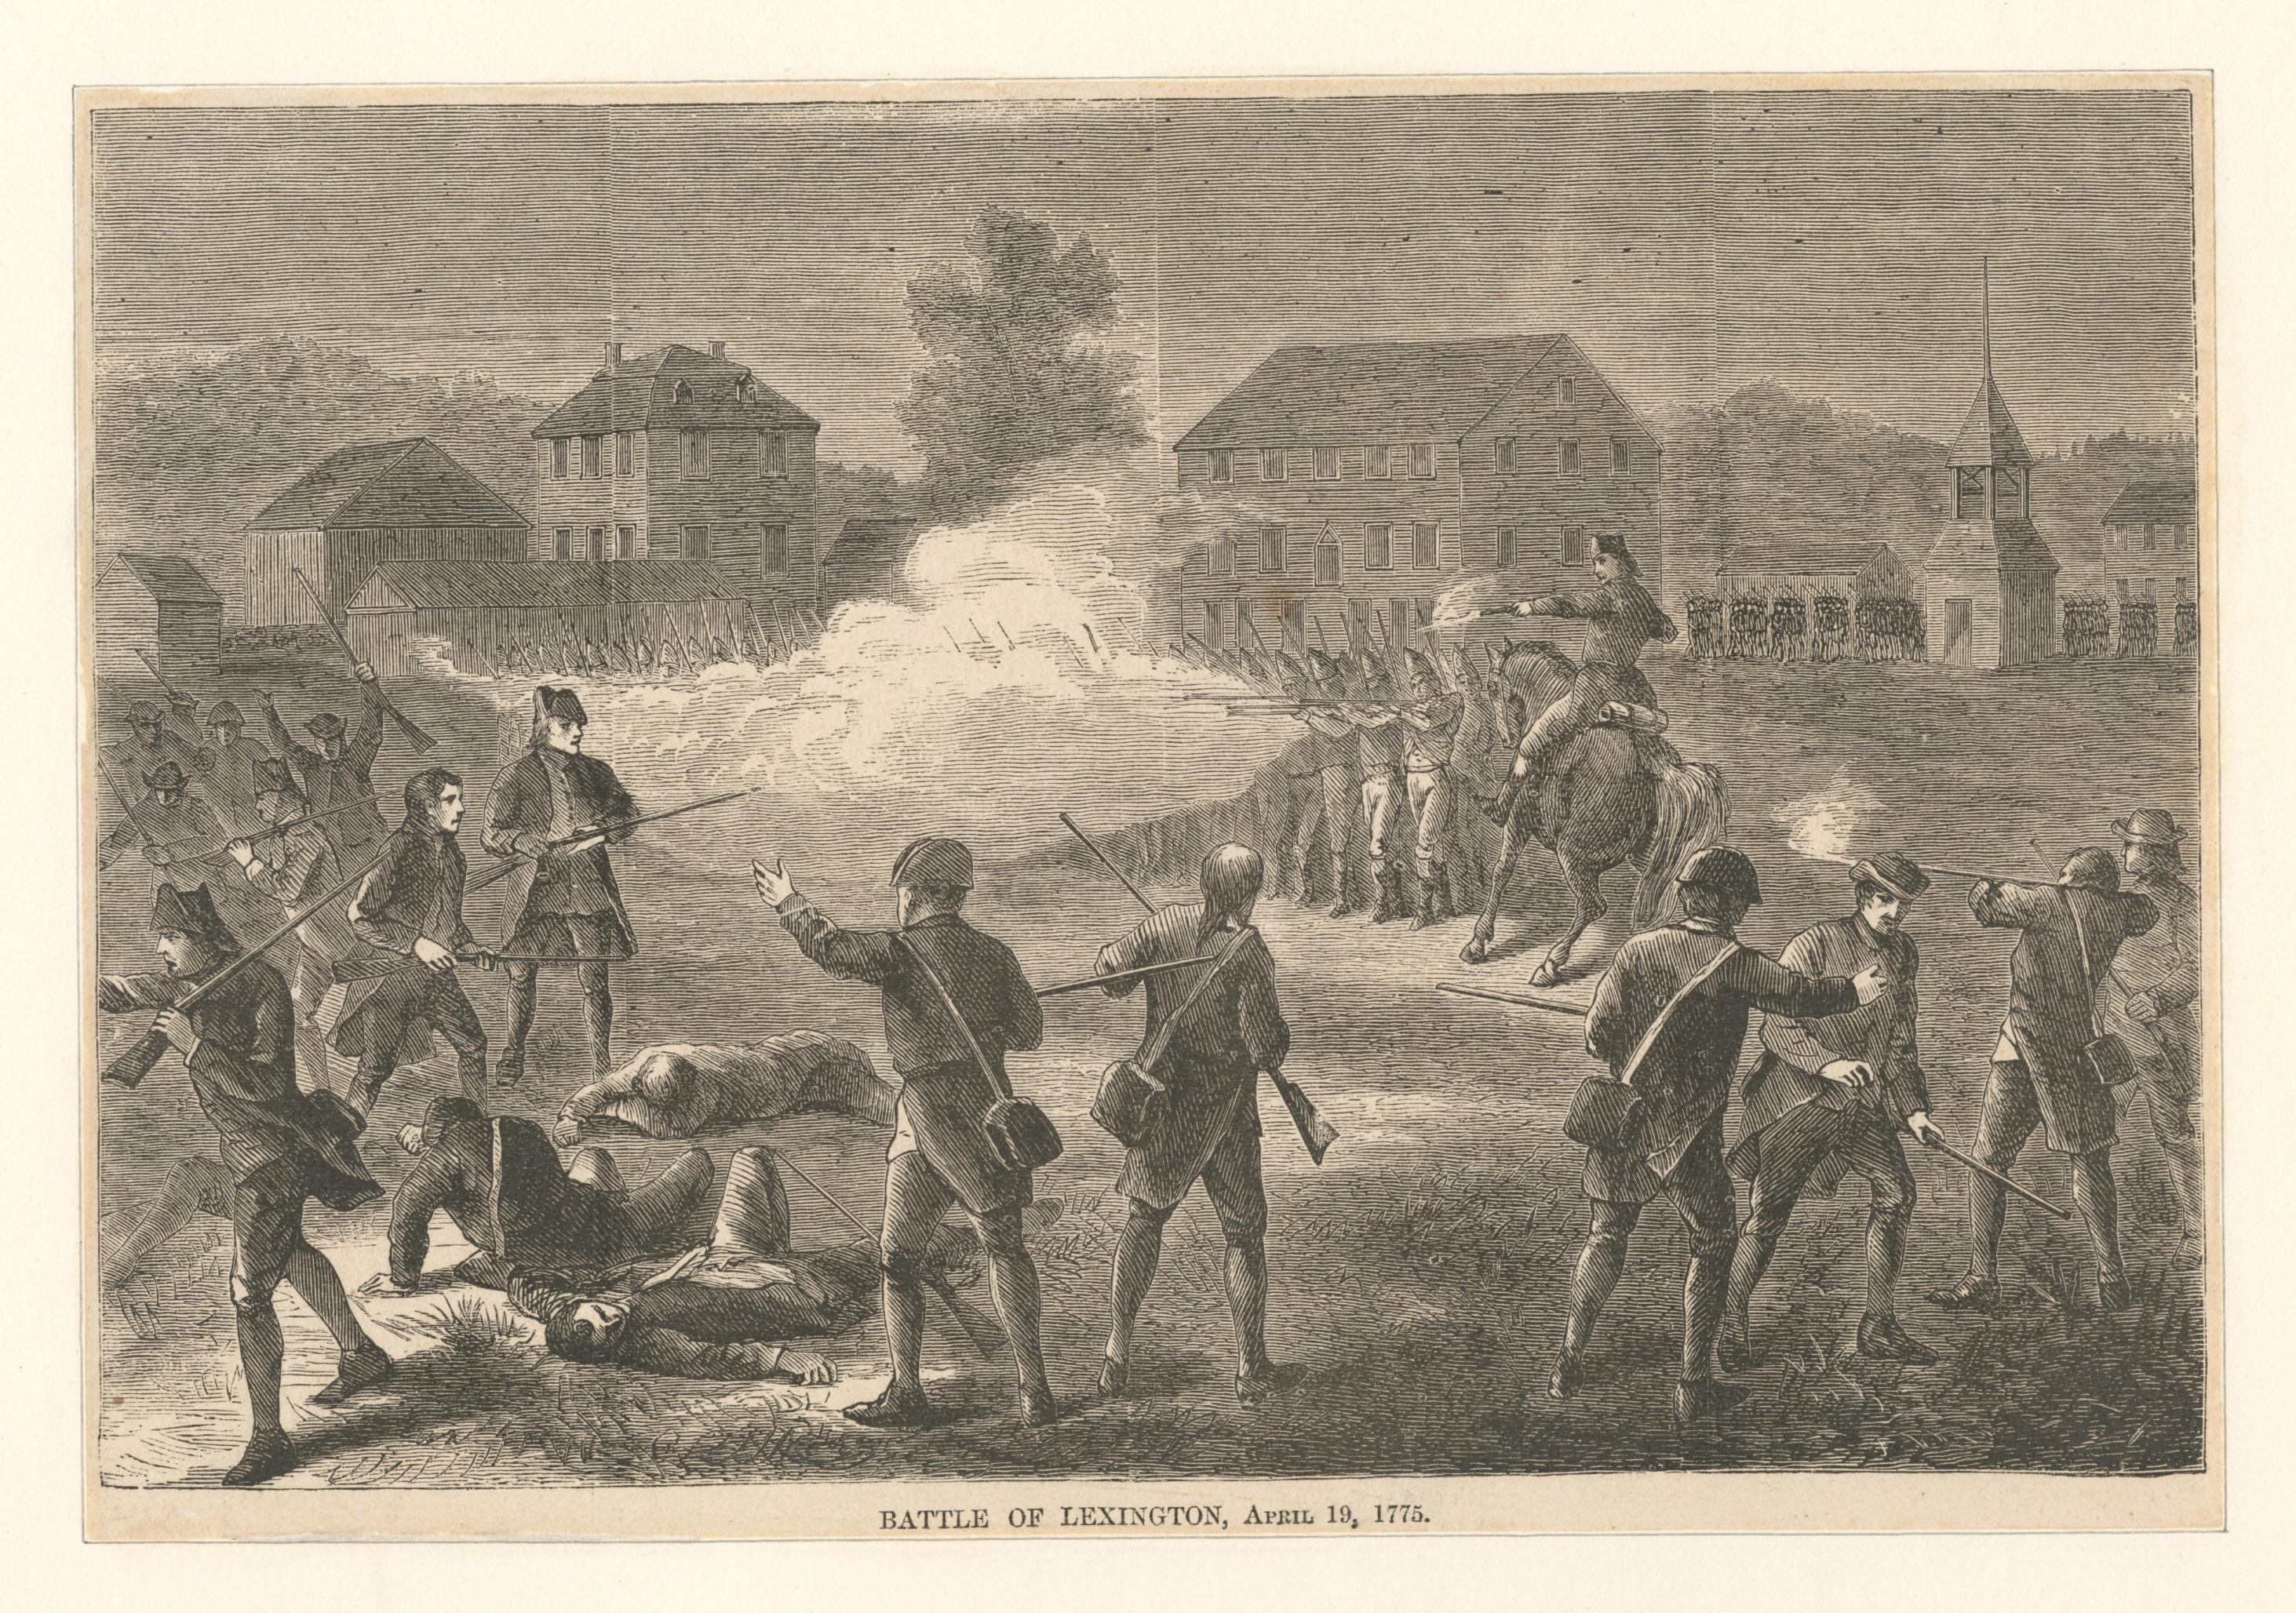 Battle of Lexington, April 19, 1775, New York Public Library